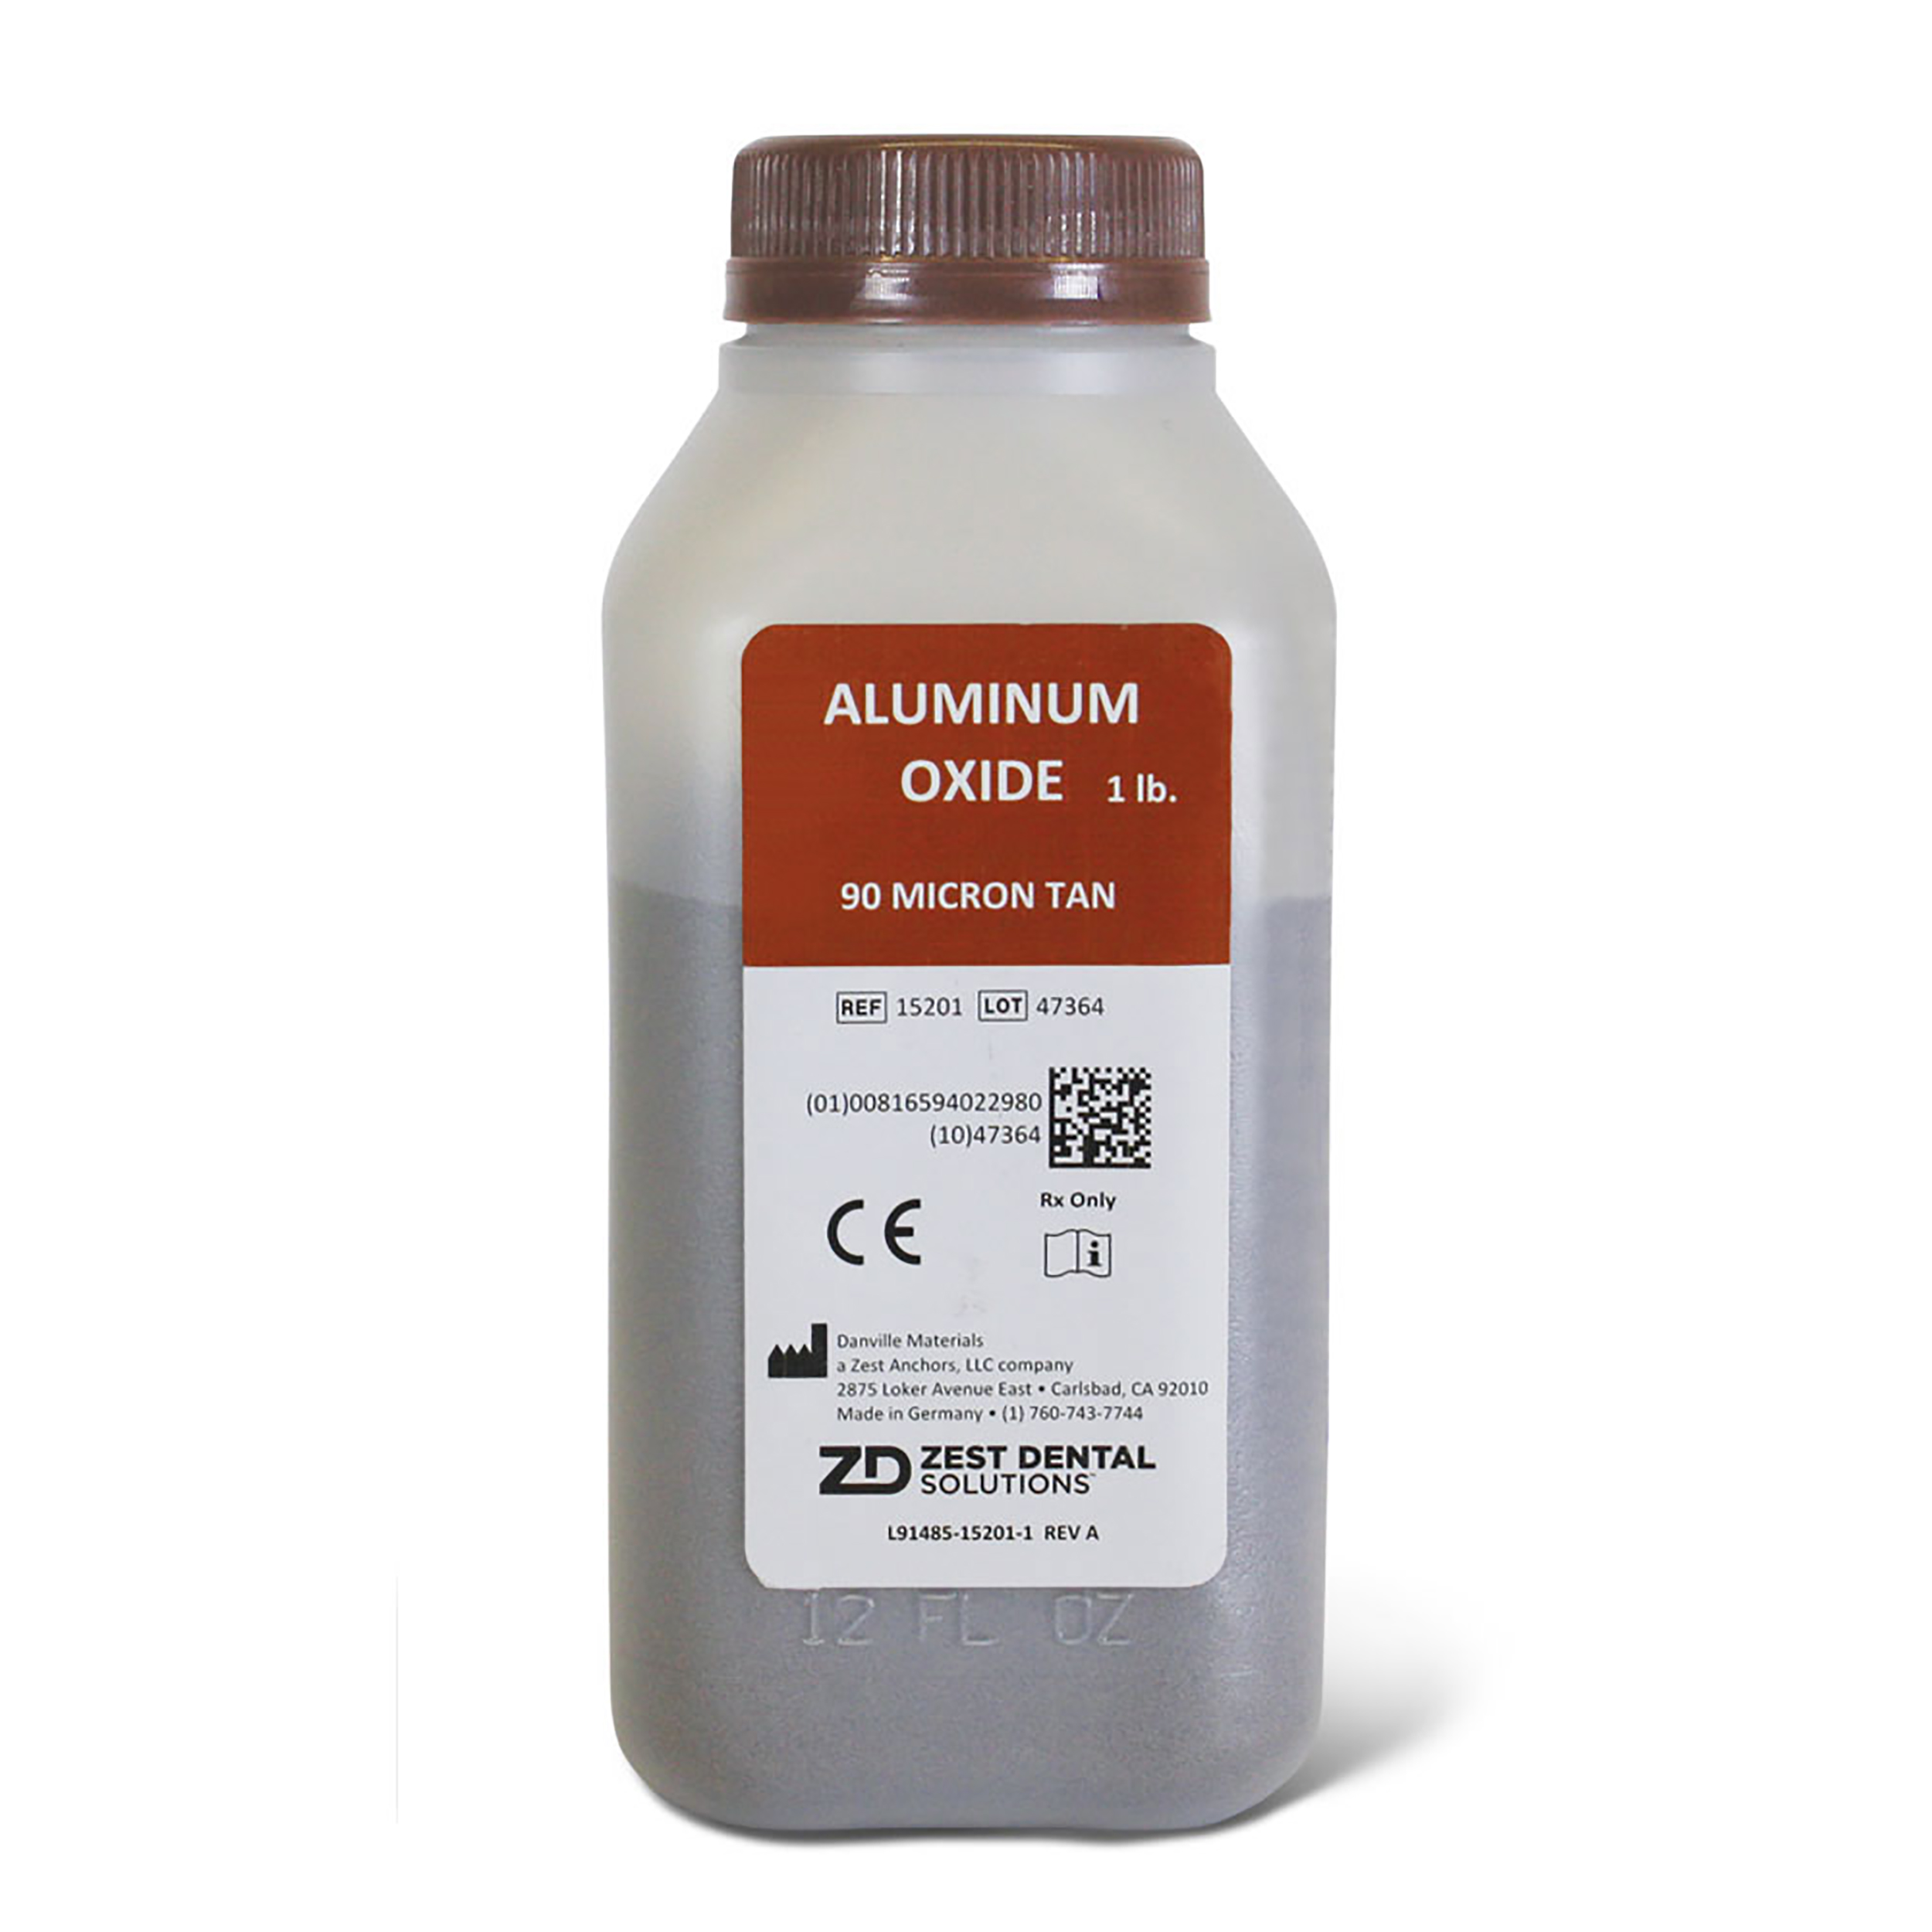 0926117 TruEtch Aluminum Oxide 90 Micron, Tan, 1 lb.